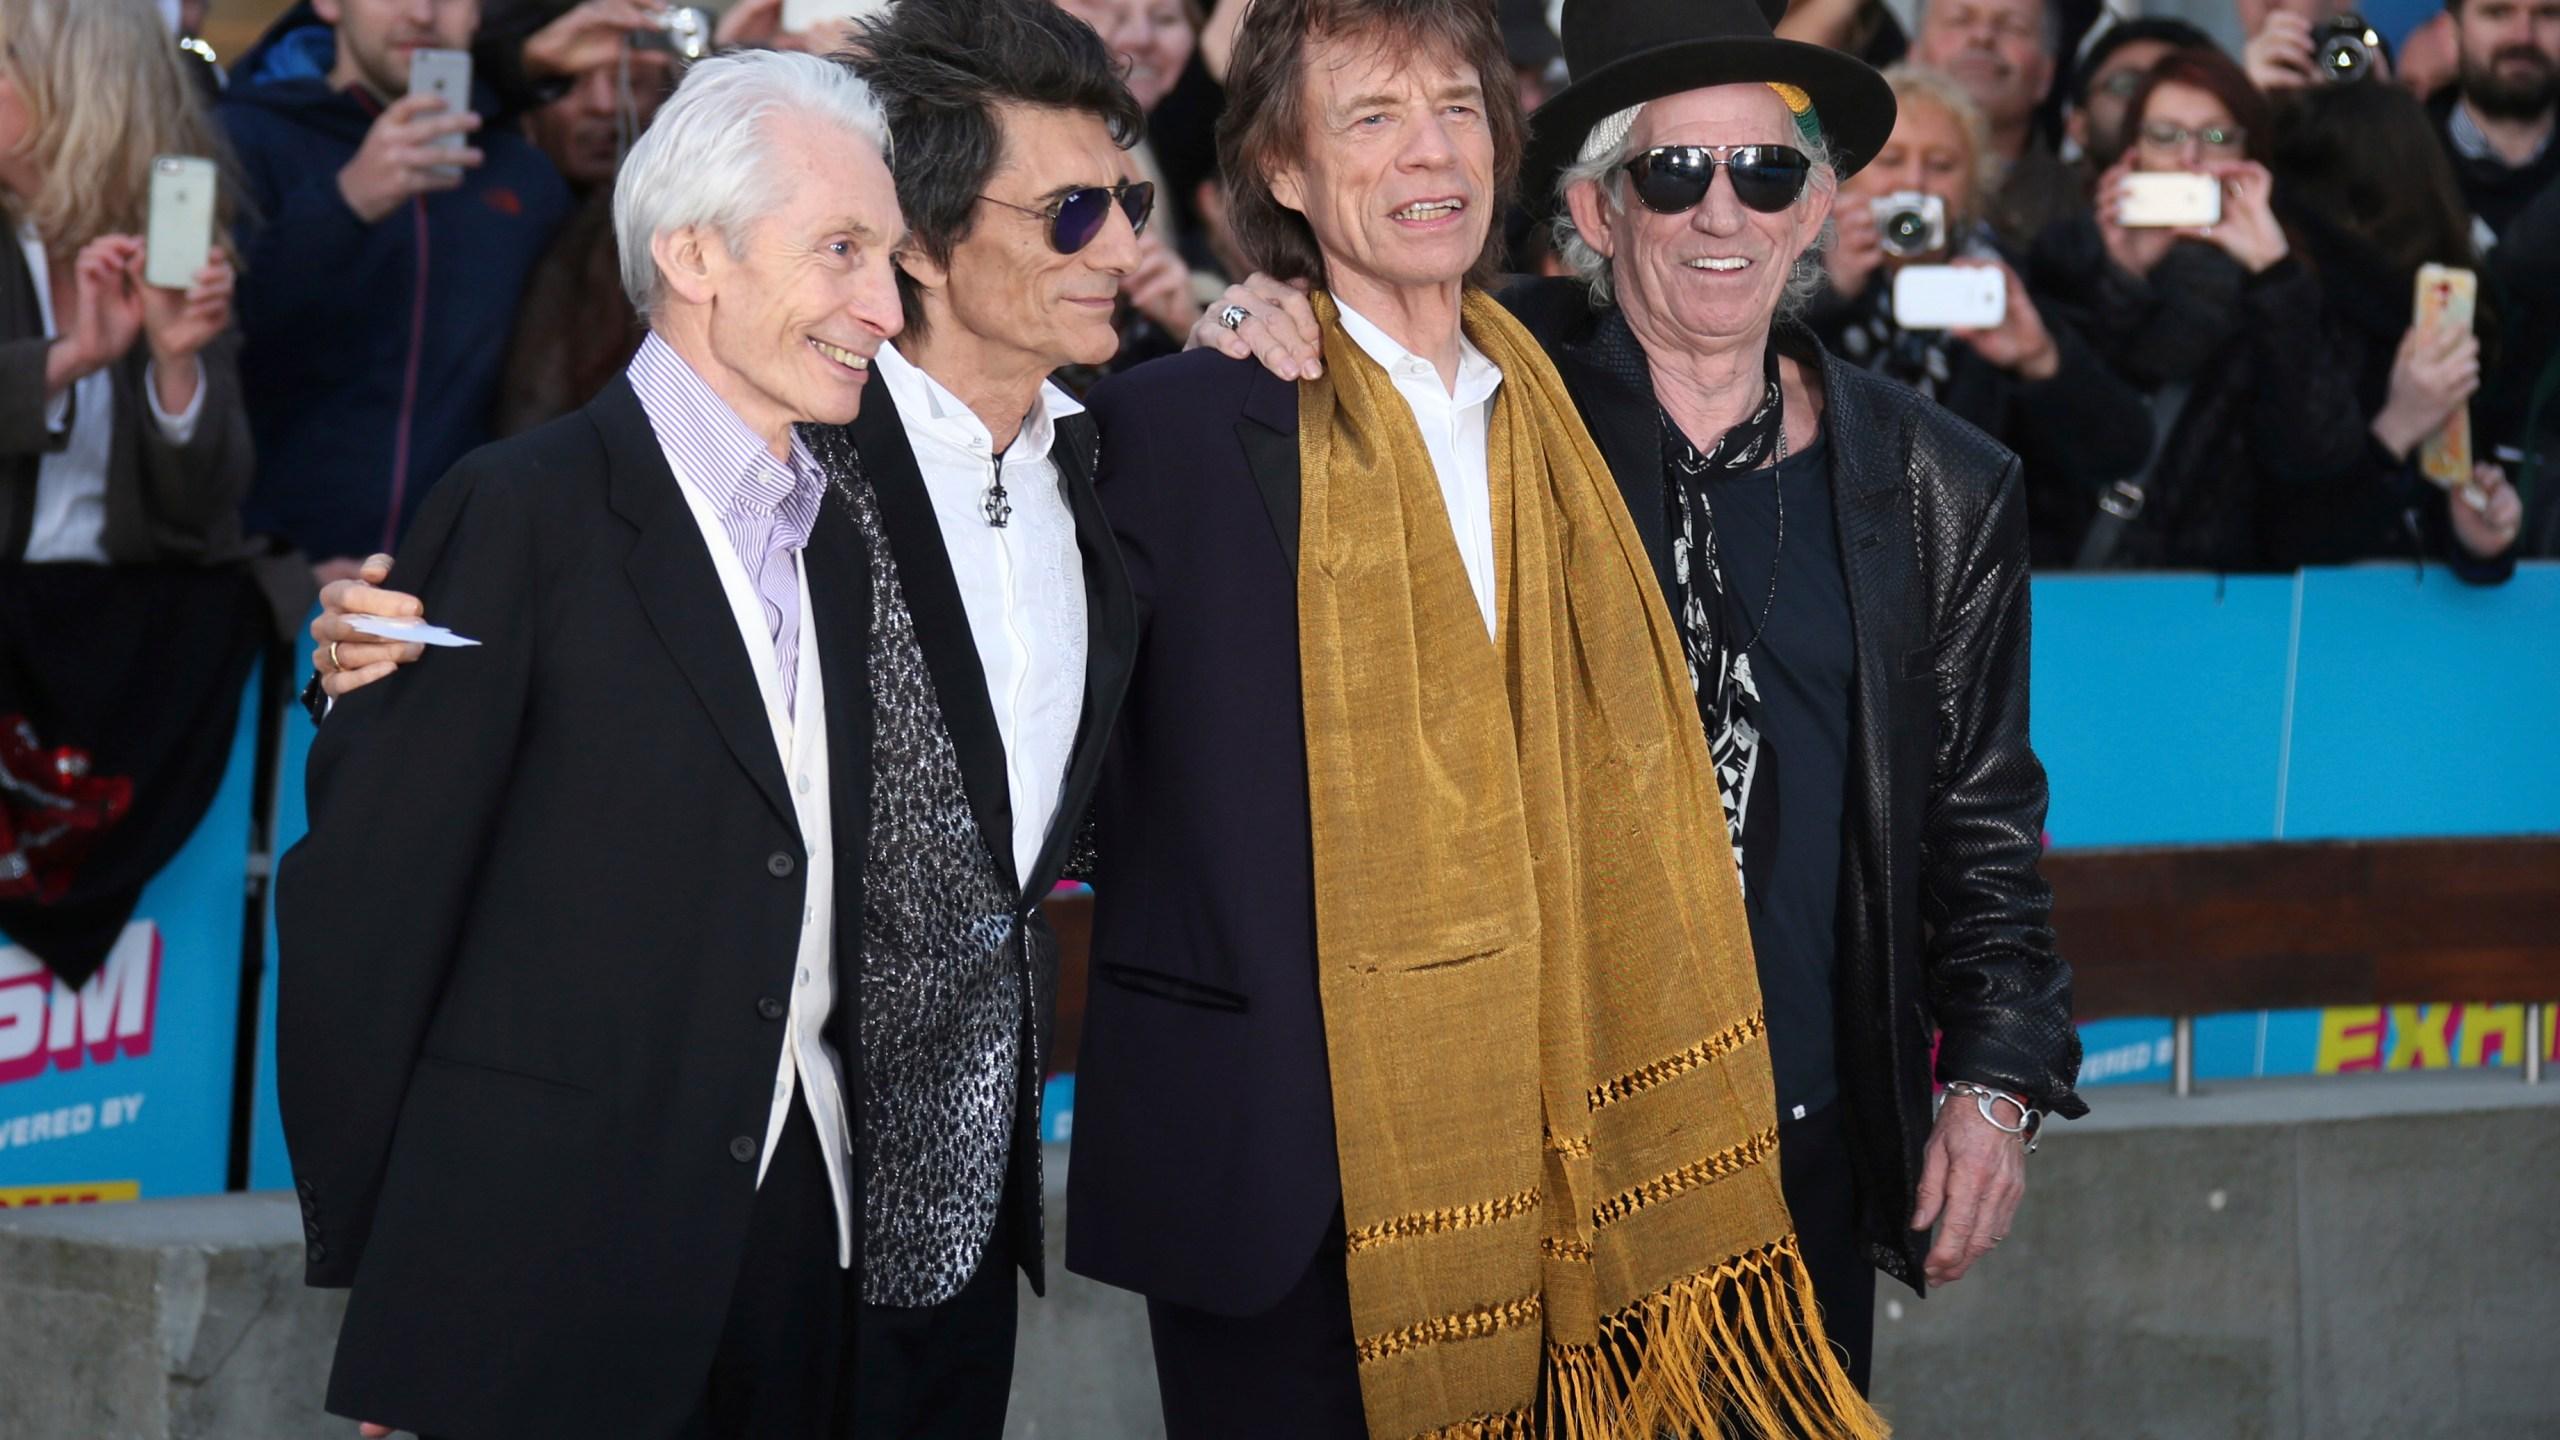 Charlie Watts, Ronnie Wood, Mick Jagger, Keith Richards